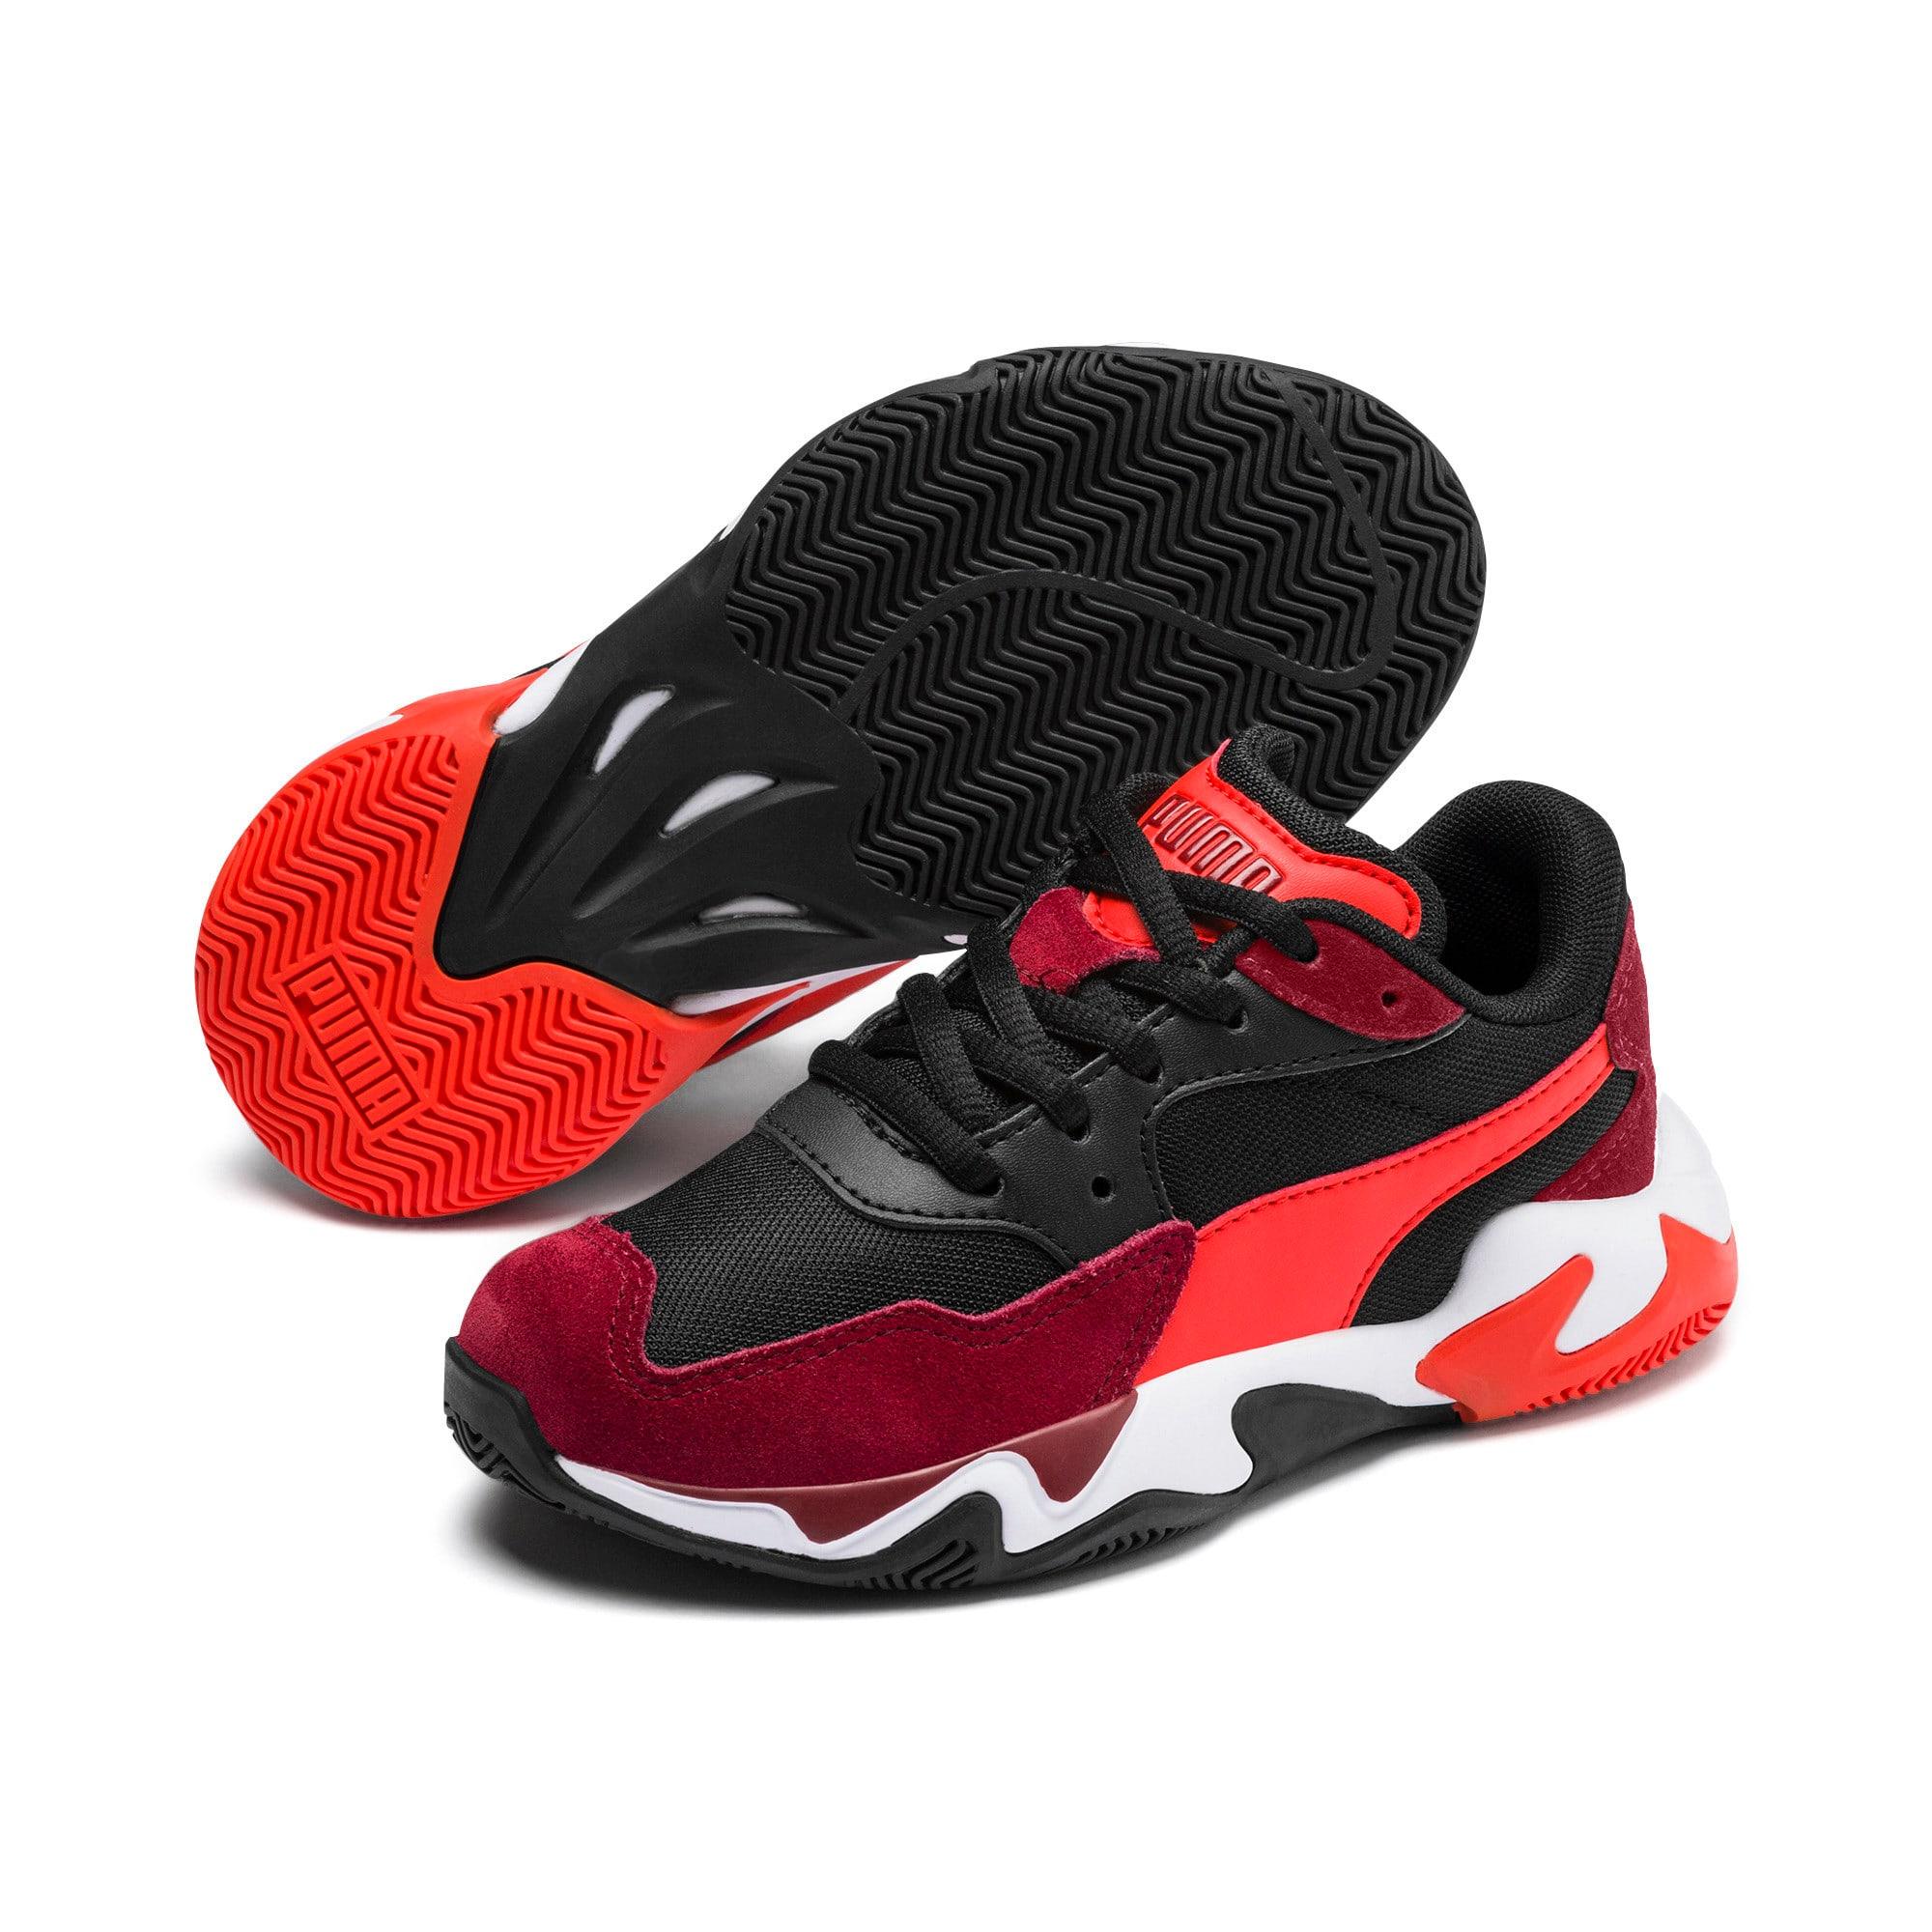 Miniatura 2 de Zapatos Storm Ray para niño pequeño, Rhubarb-Puma Black, mediano